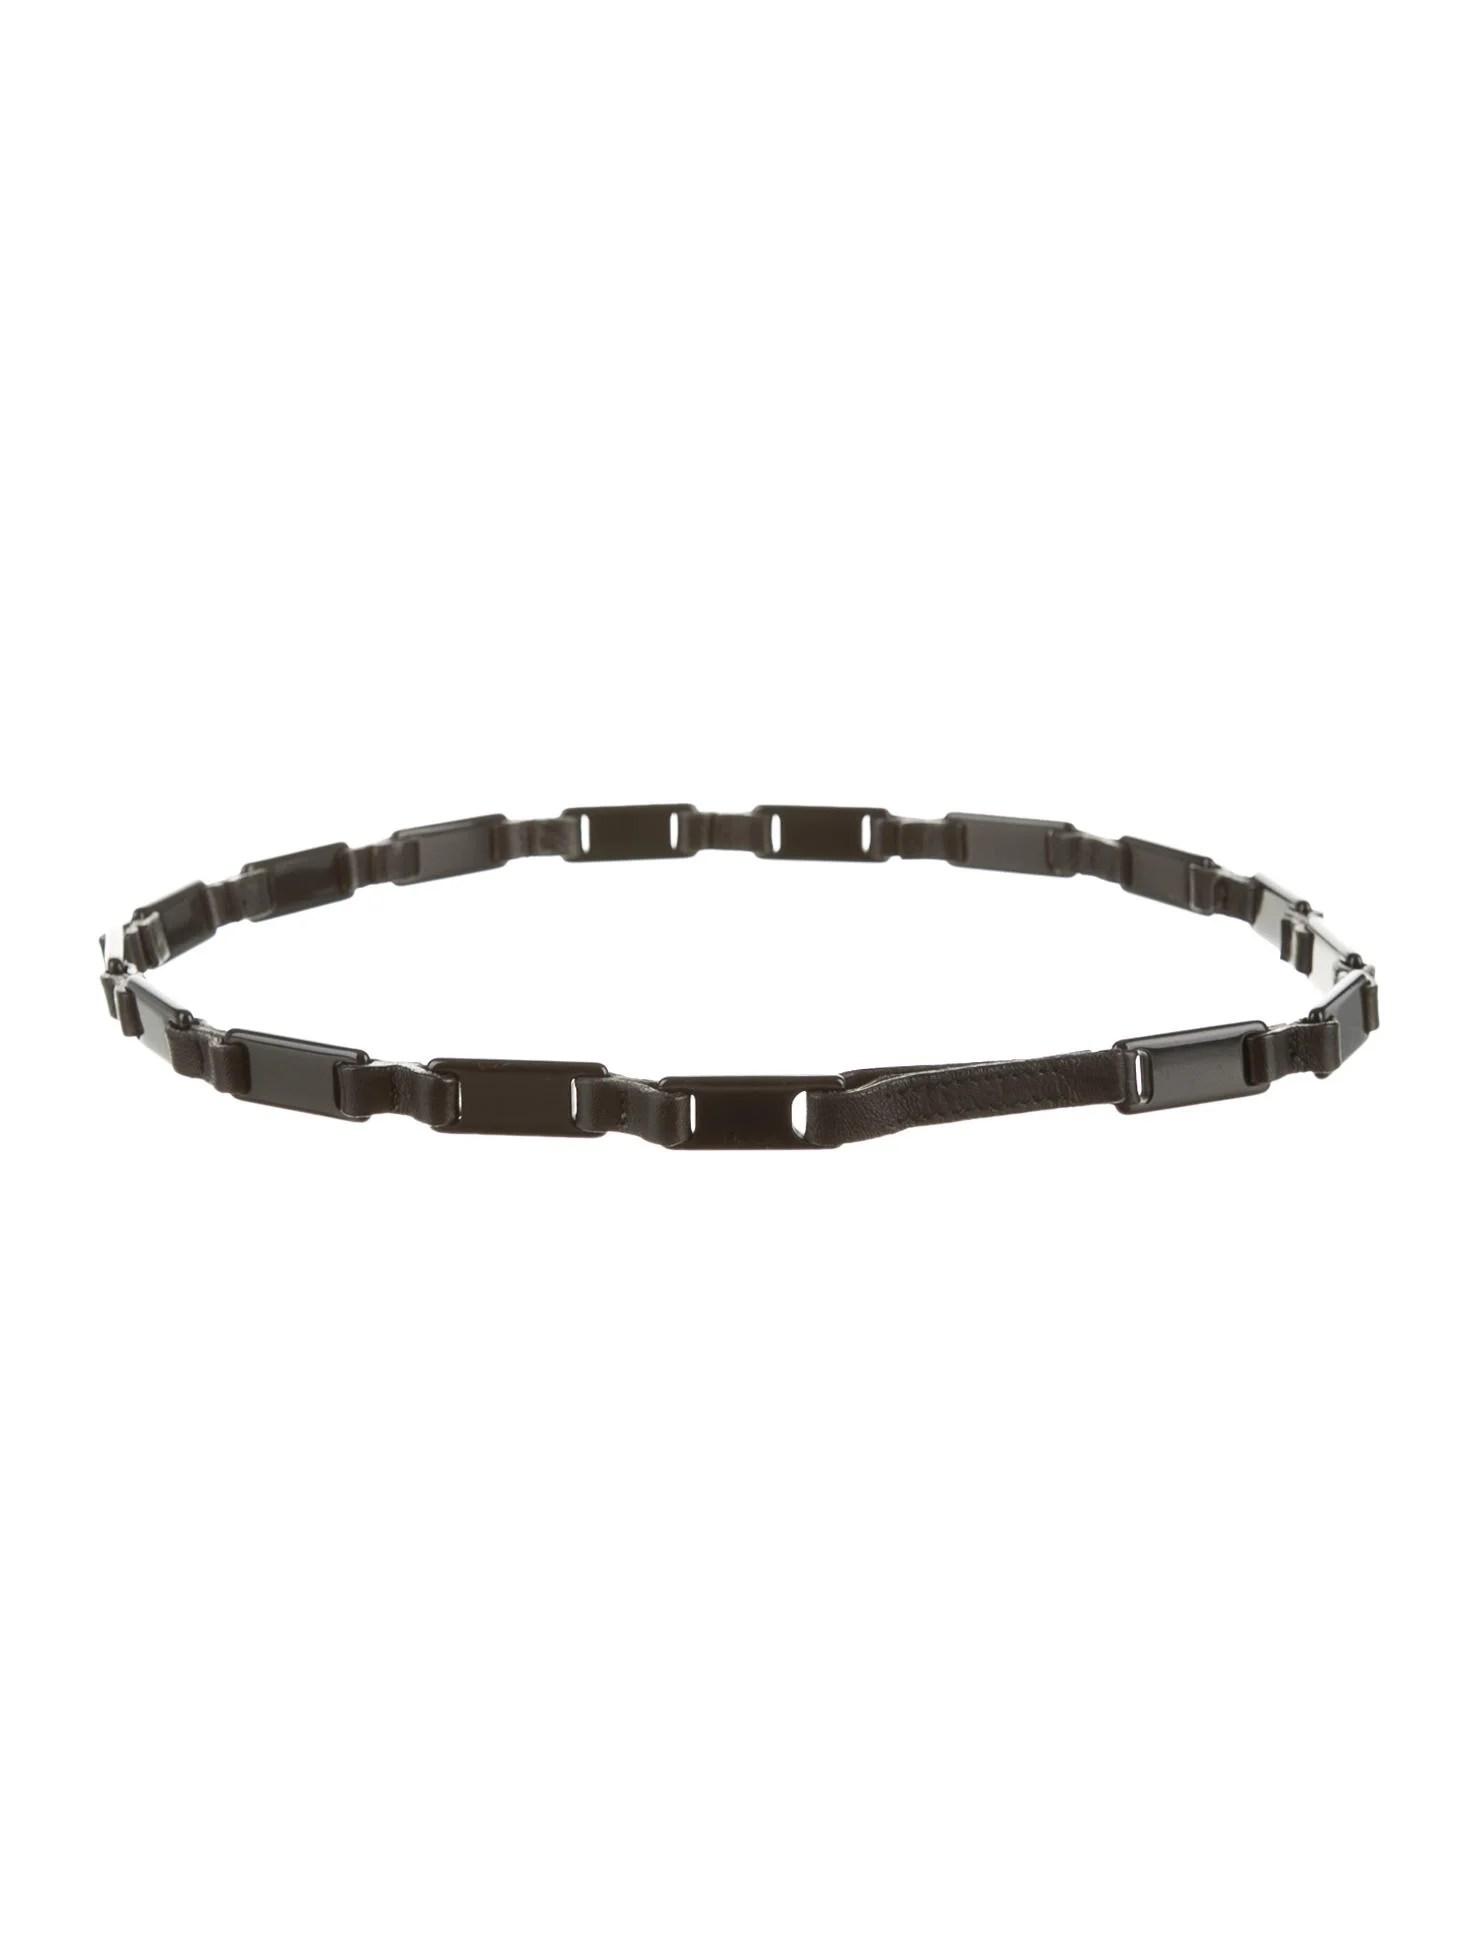 Prada Chain Link Belt